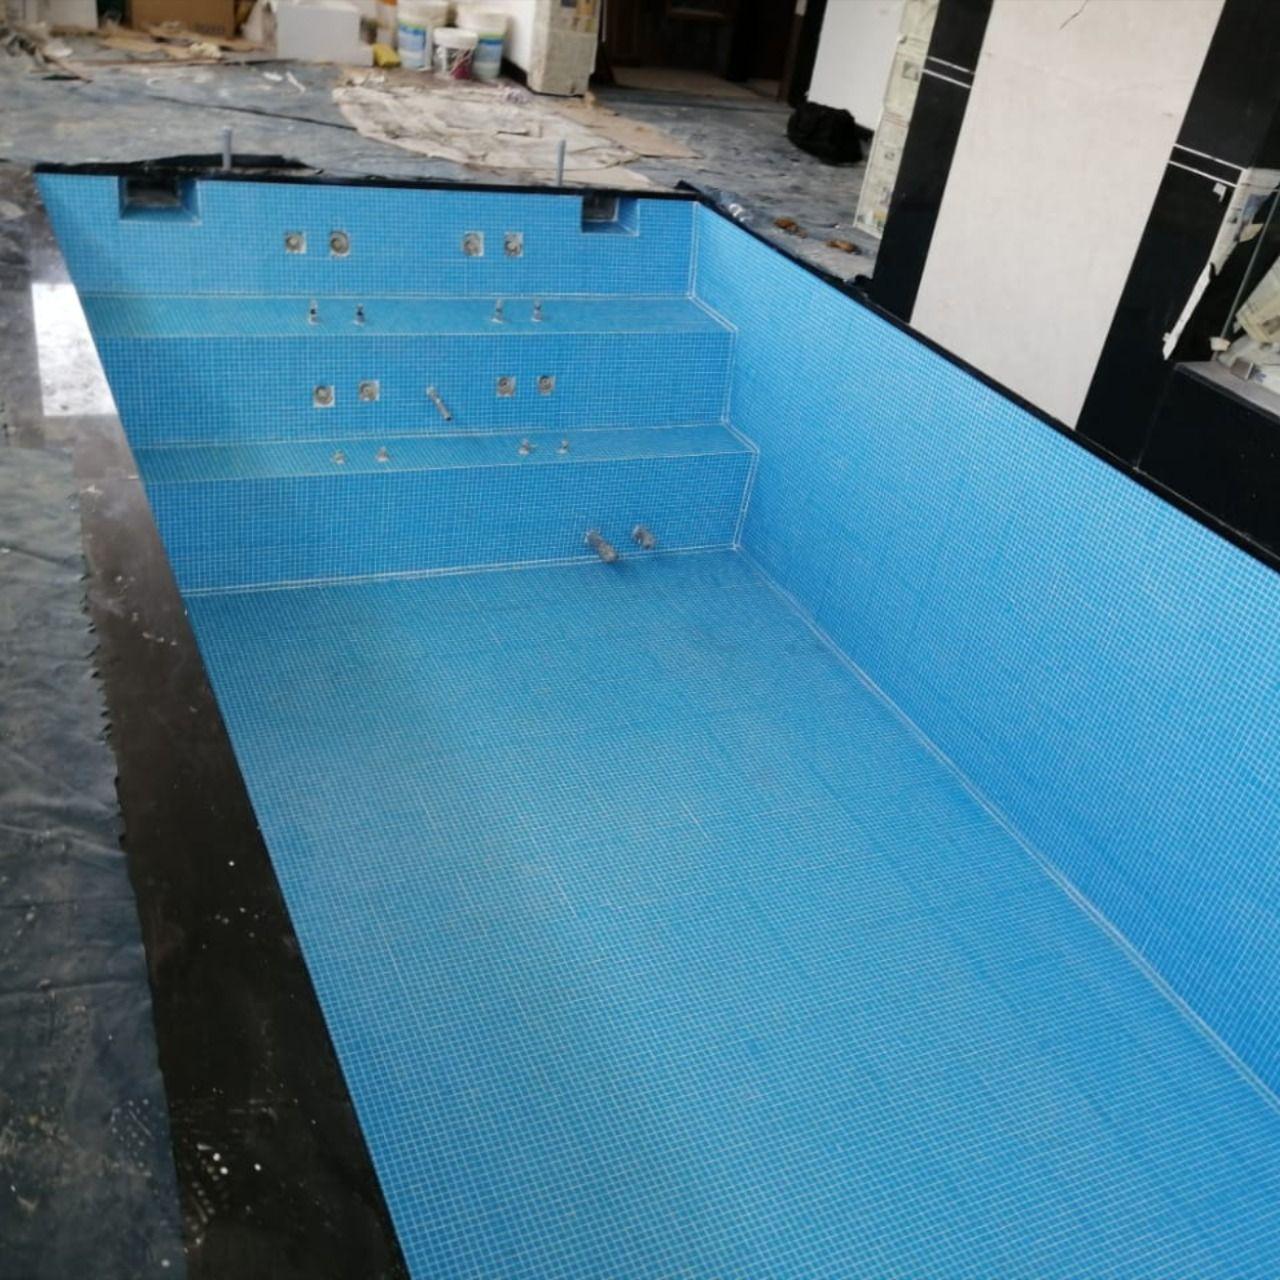 Swimming Pool Tile Laying With Warranty Kerala Pool Tile Swimming Pools Swimming Pool Tiles